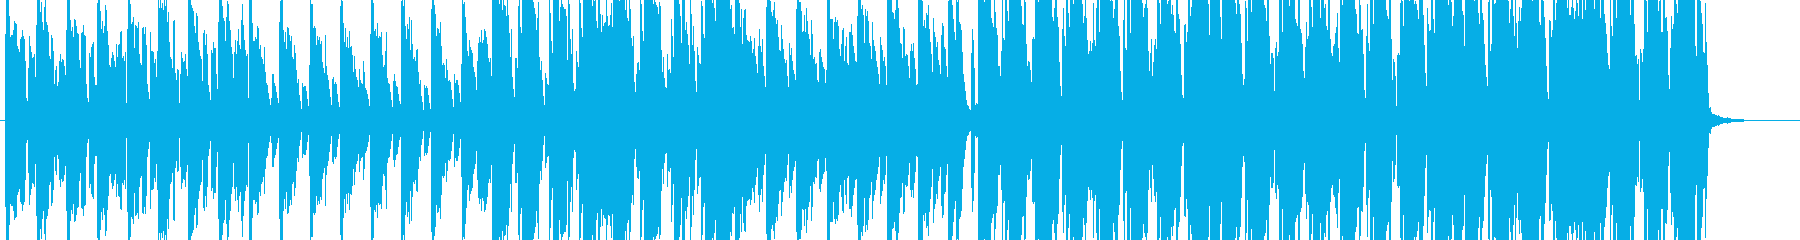 Kawaii×シャボン玉【主歌なし】の再生済みの波形